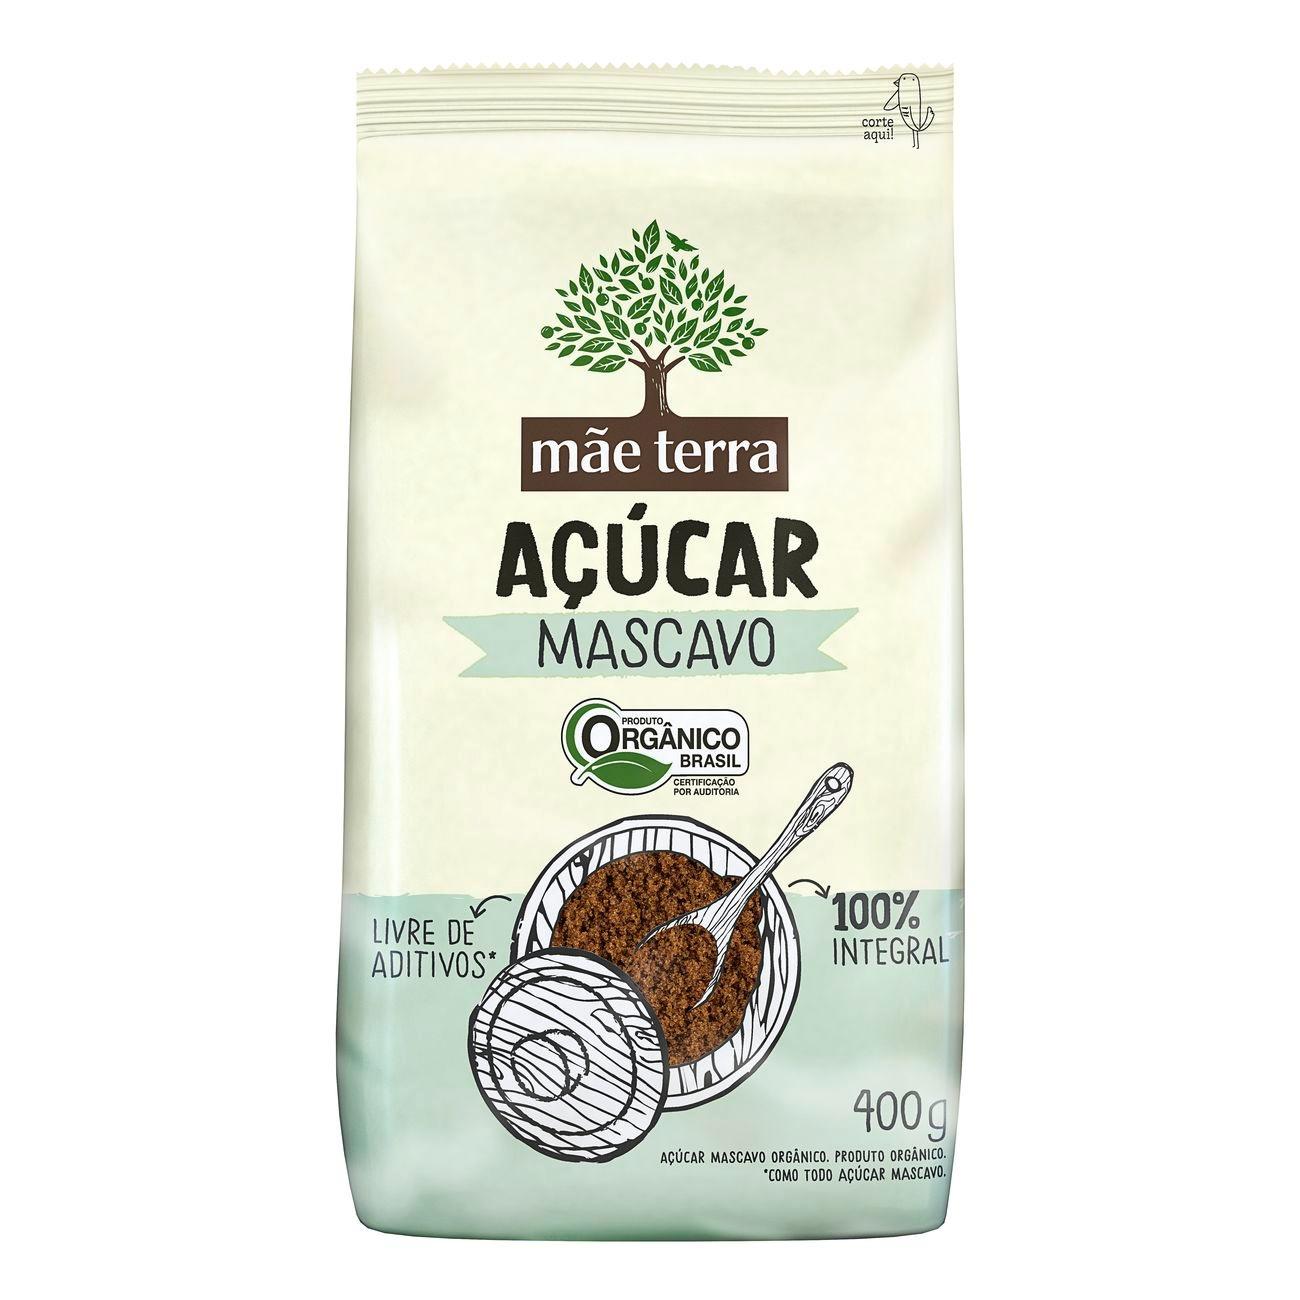 Açúcar Mascavo Orgânico Mãe Terra 400g